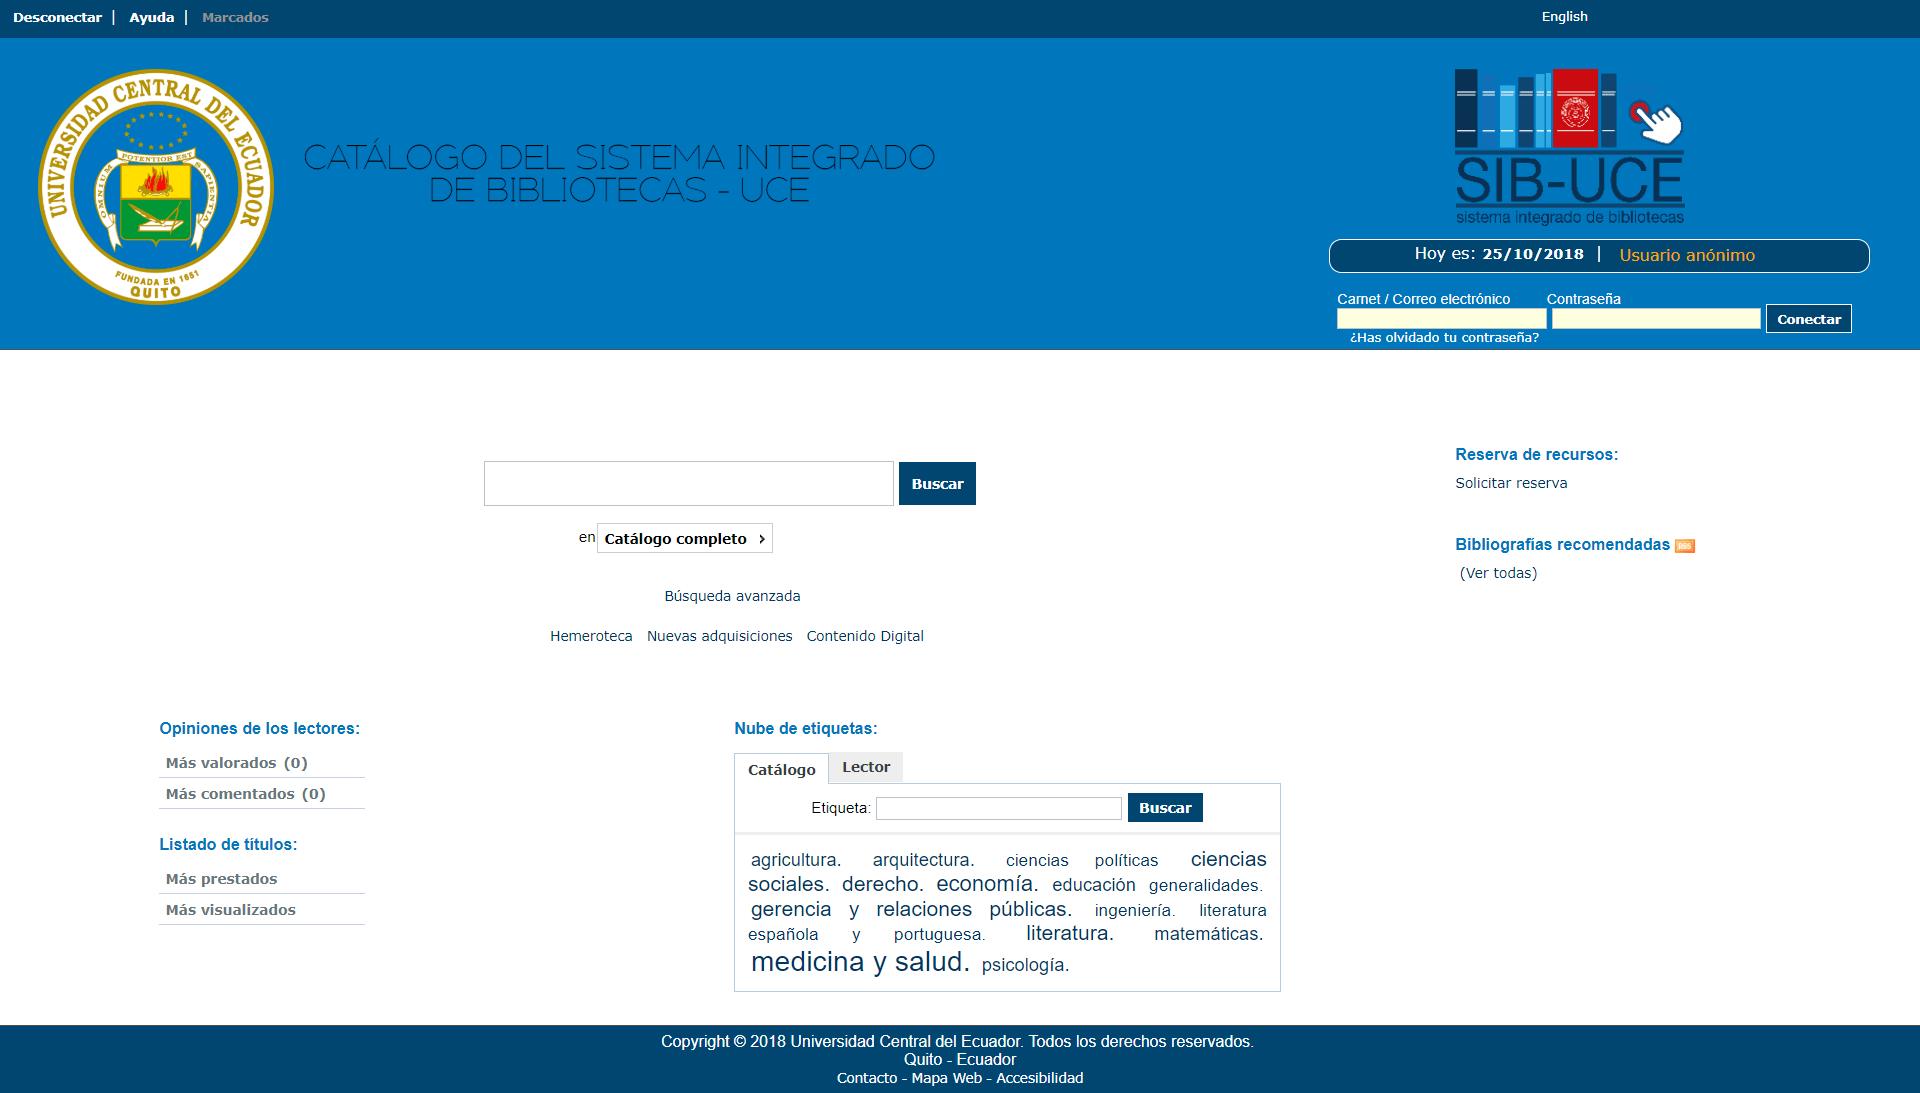 Catálogo del sistema integrado de bibliotecas - UCE